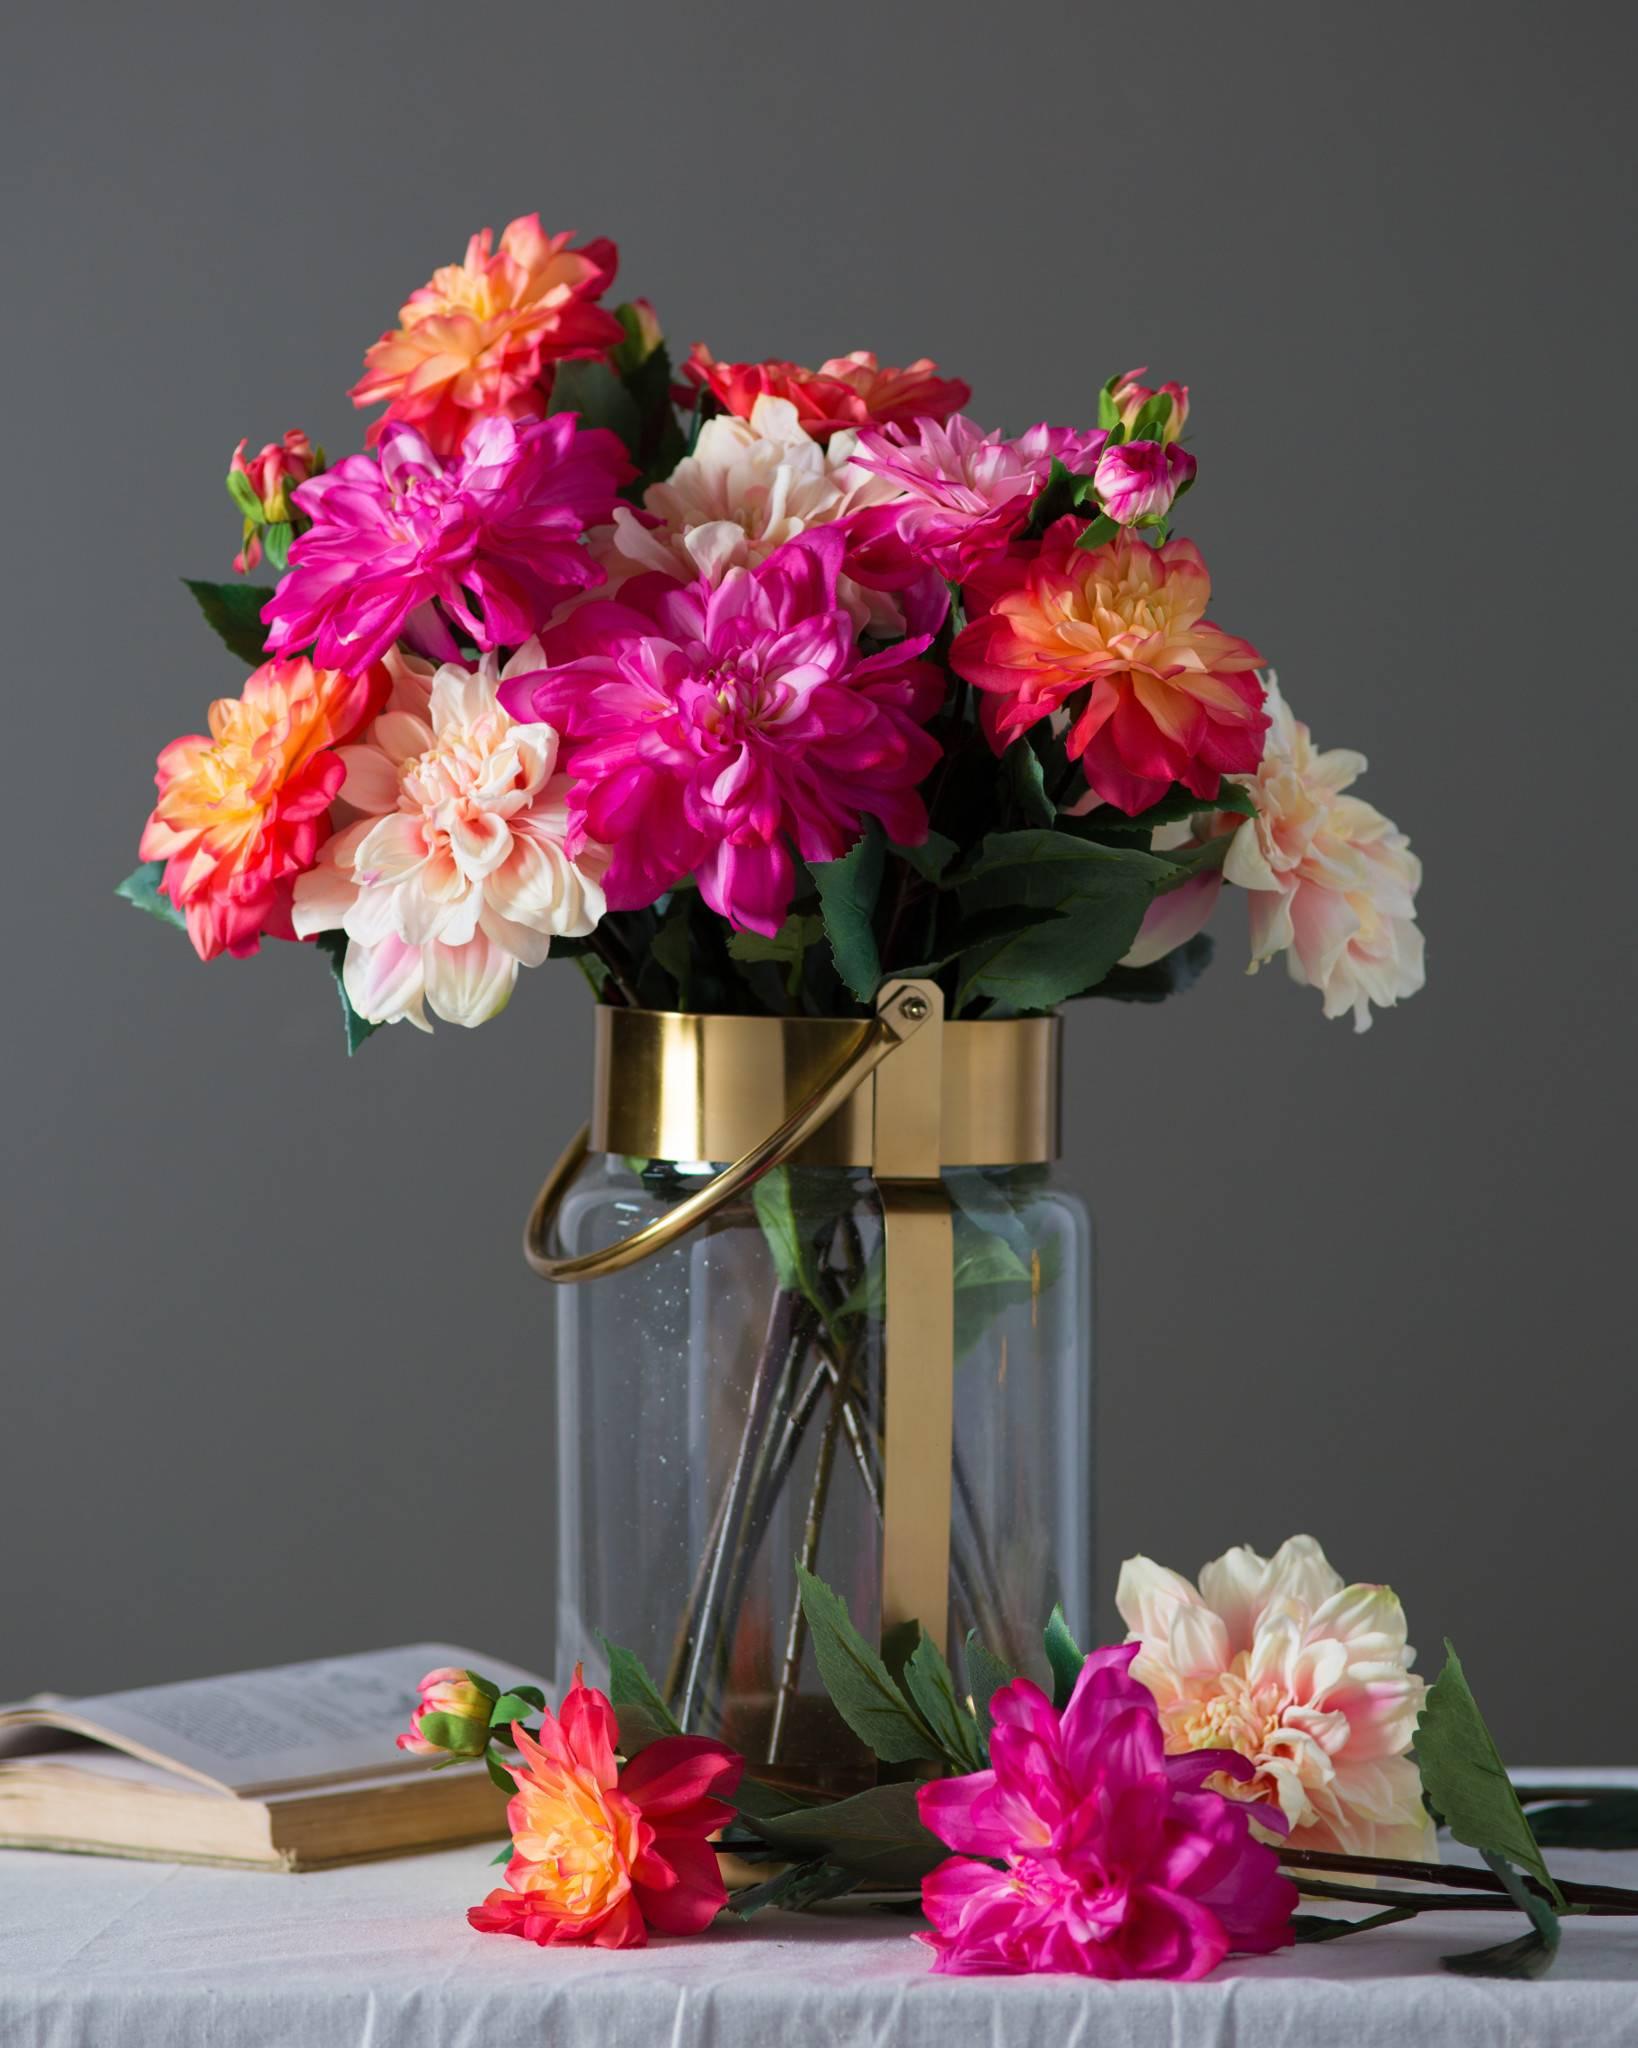 Dahlia flower stems balsam hill dahlia flower stems main peachlight pink and magenta sold separately izmirmasajfo Gallery